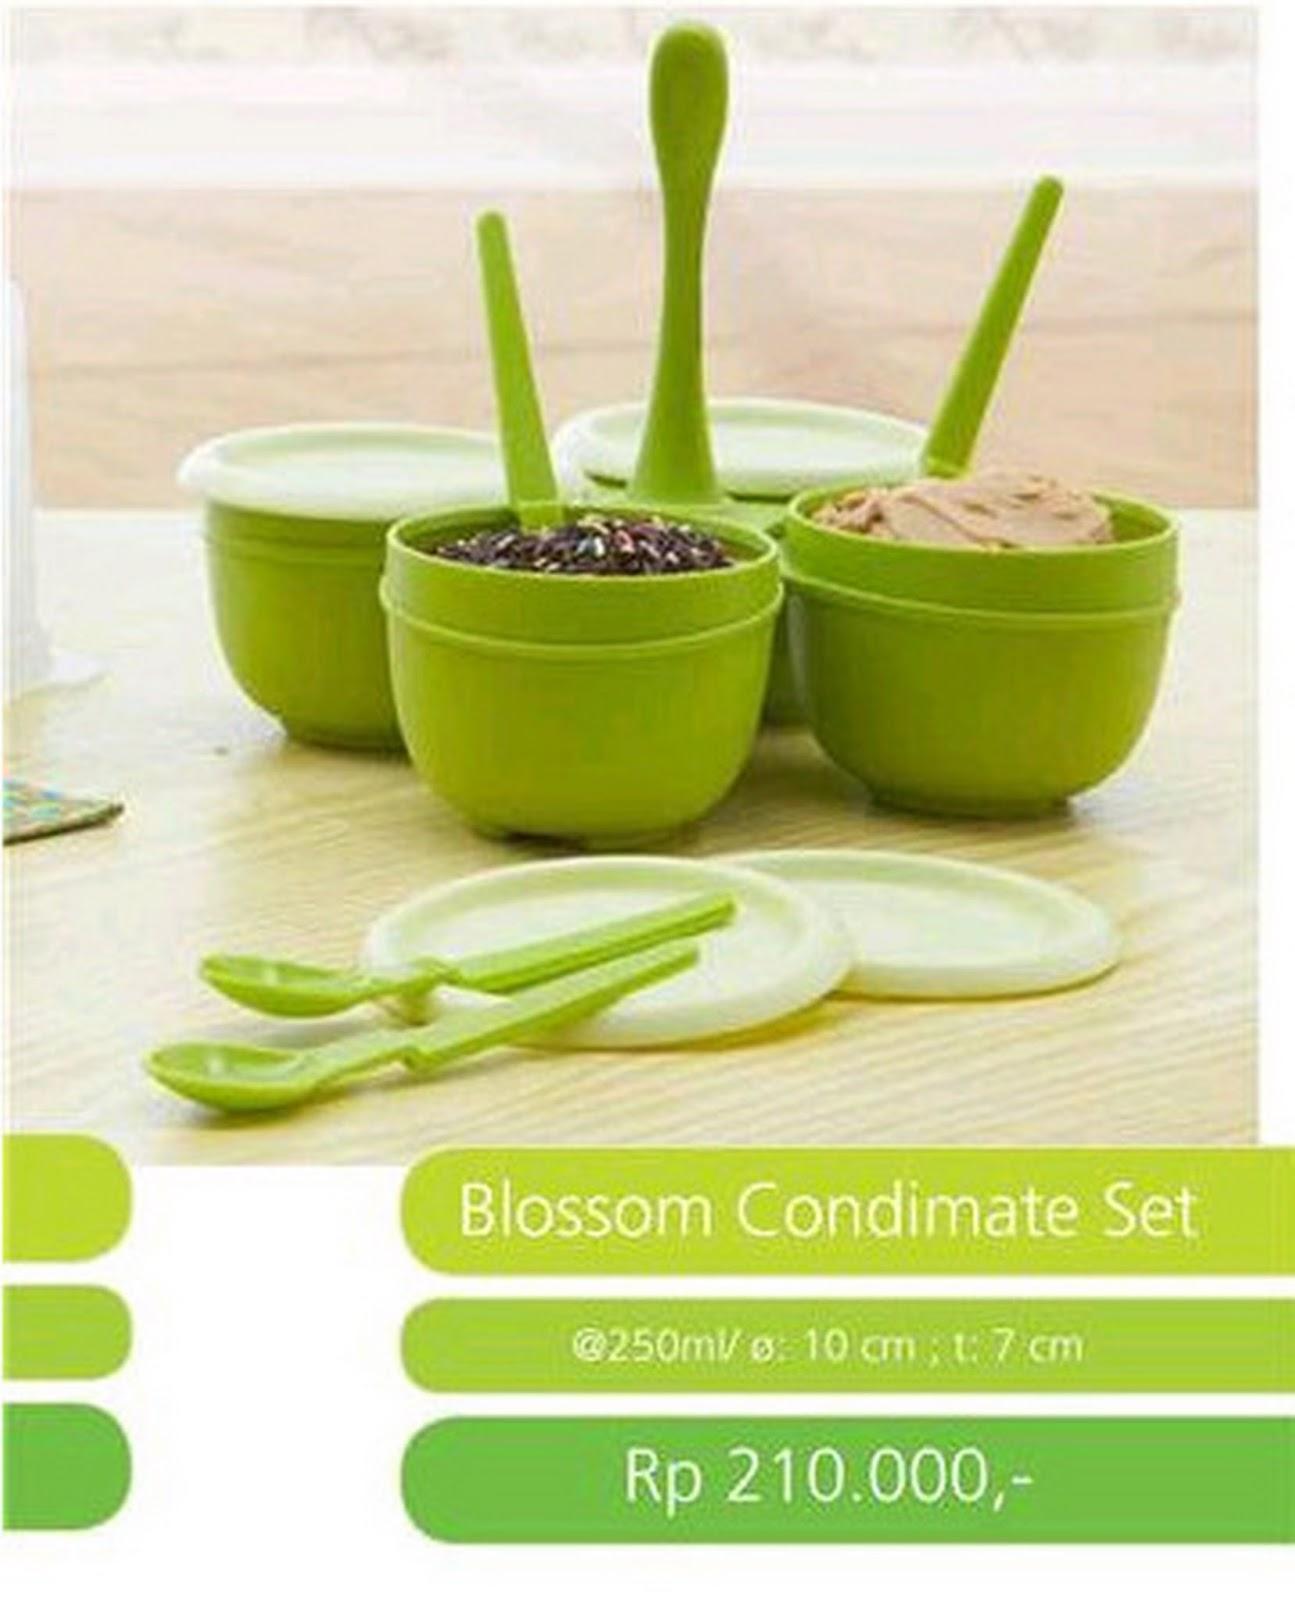 Tupperware Promo Blossom Condimate Set